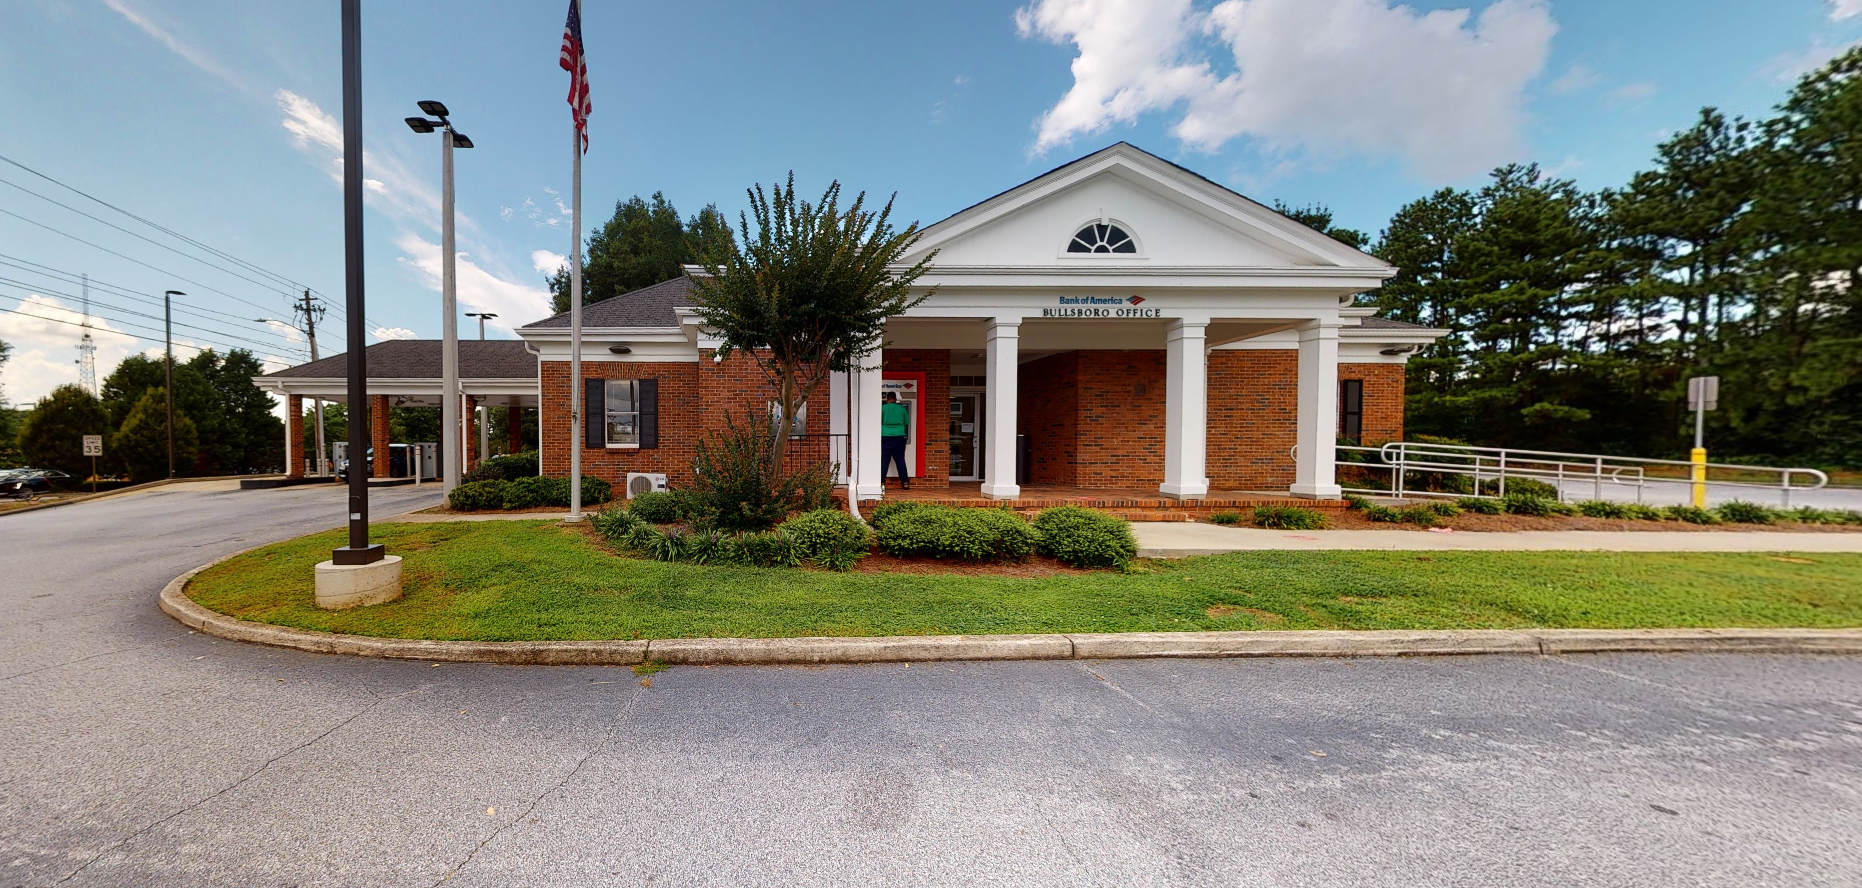 Bank of America financial center with drive-thru ATM | 60 Bullsboro Dr, Newnan, GA 30263